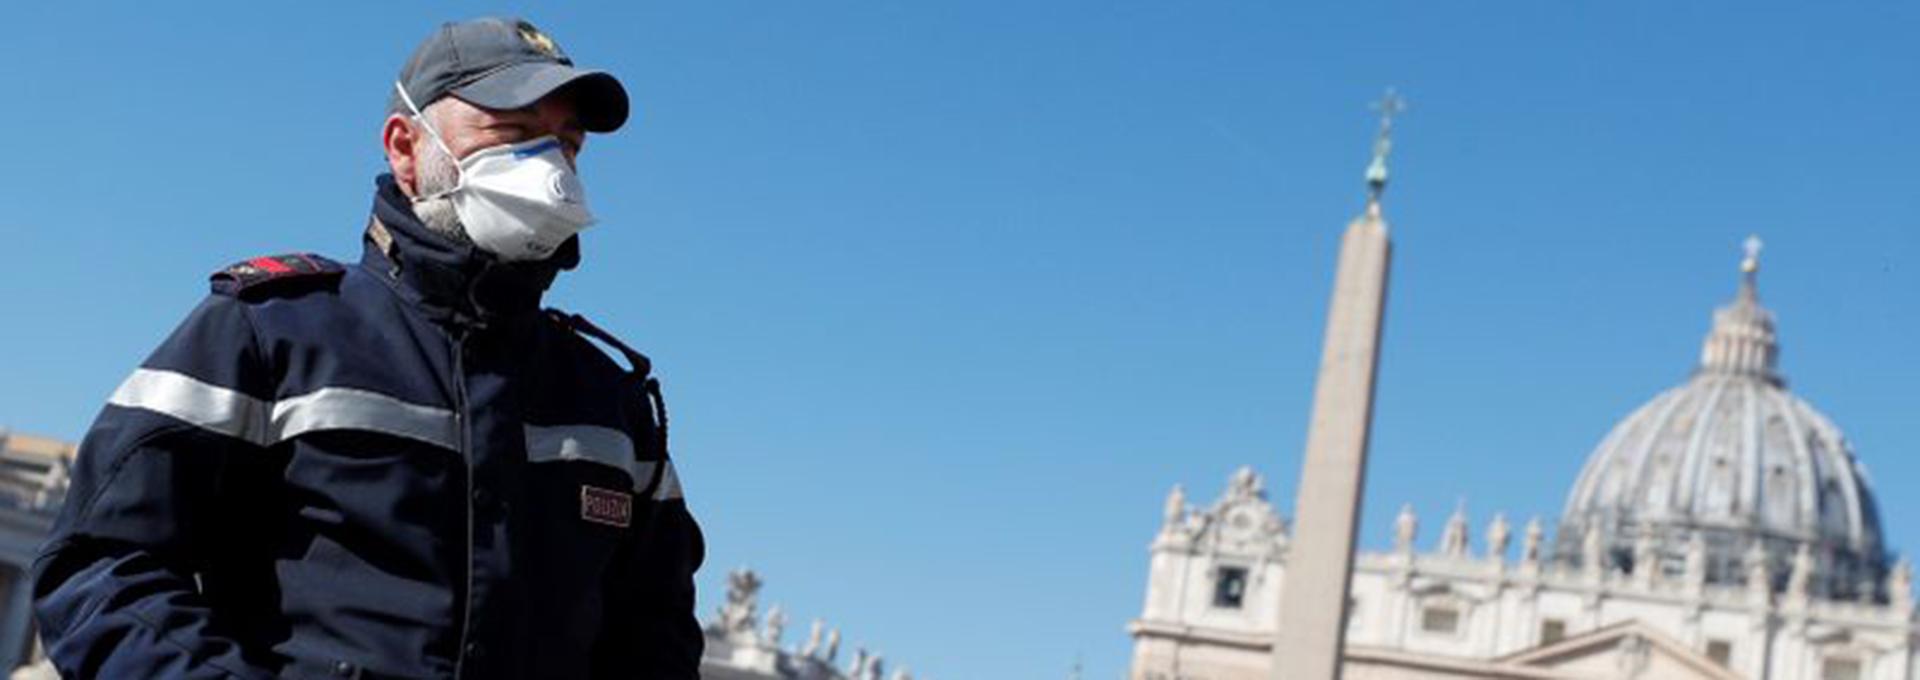 Un policía con mascarilla vigila una Plaza de San Pedro vacía desde Roma, Italia. (REUTERS/Guglielmo Mangiapane)